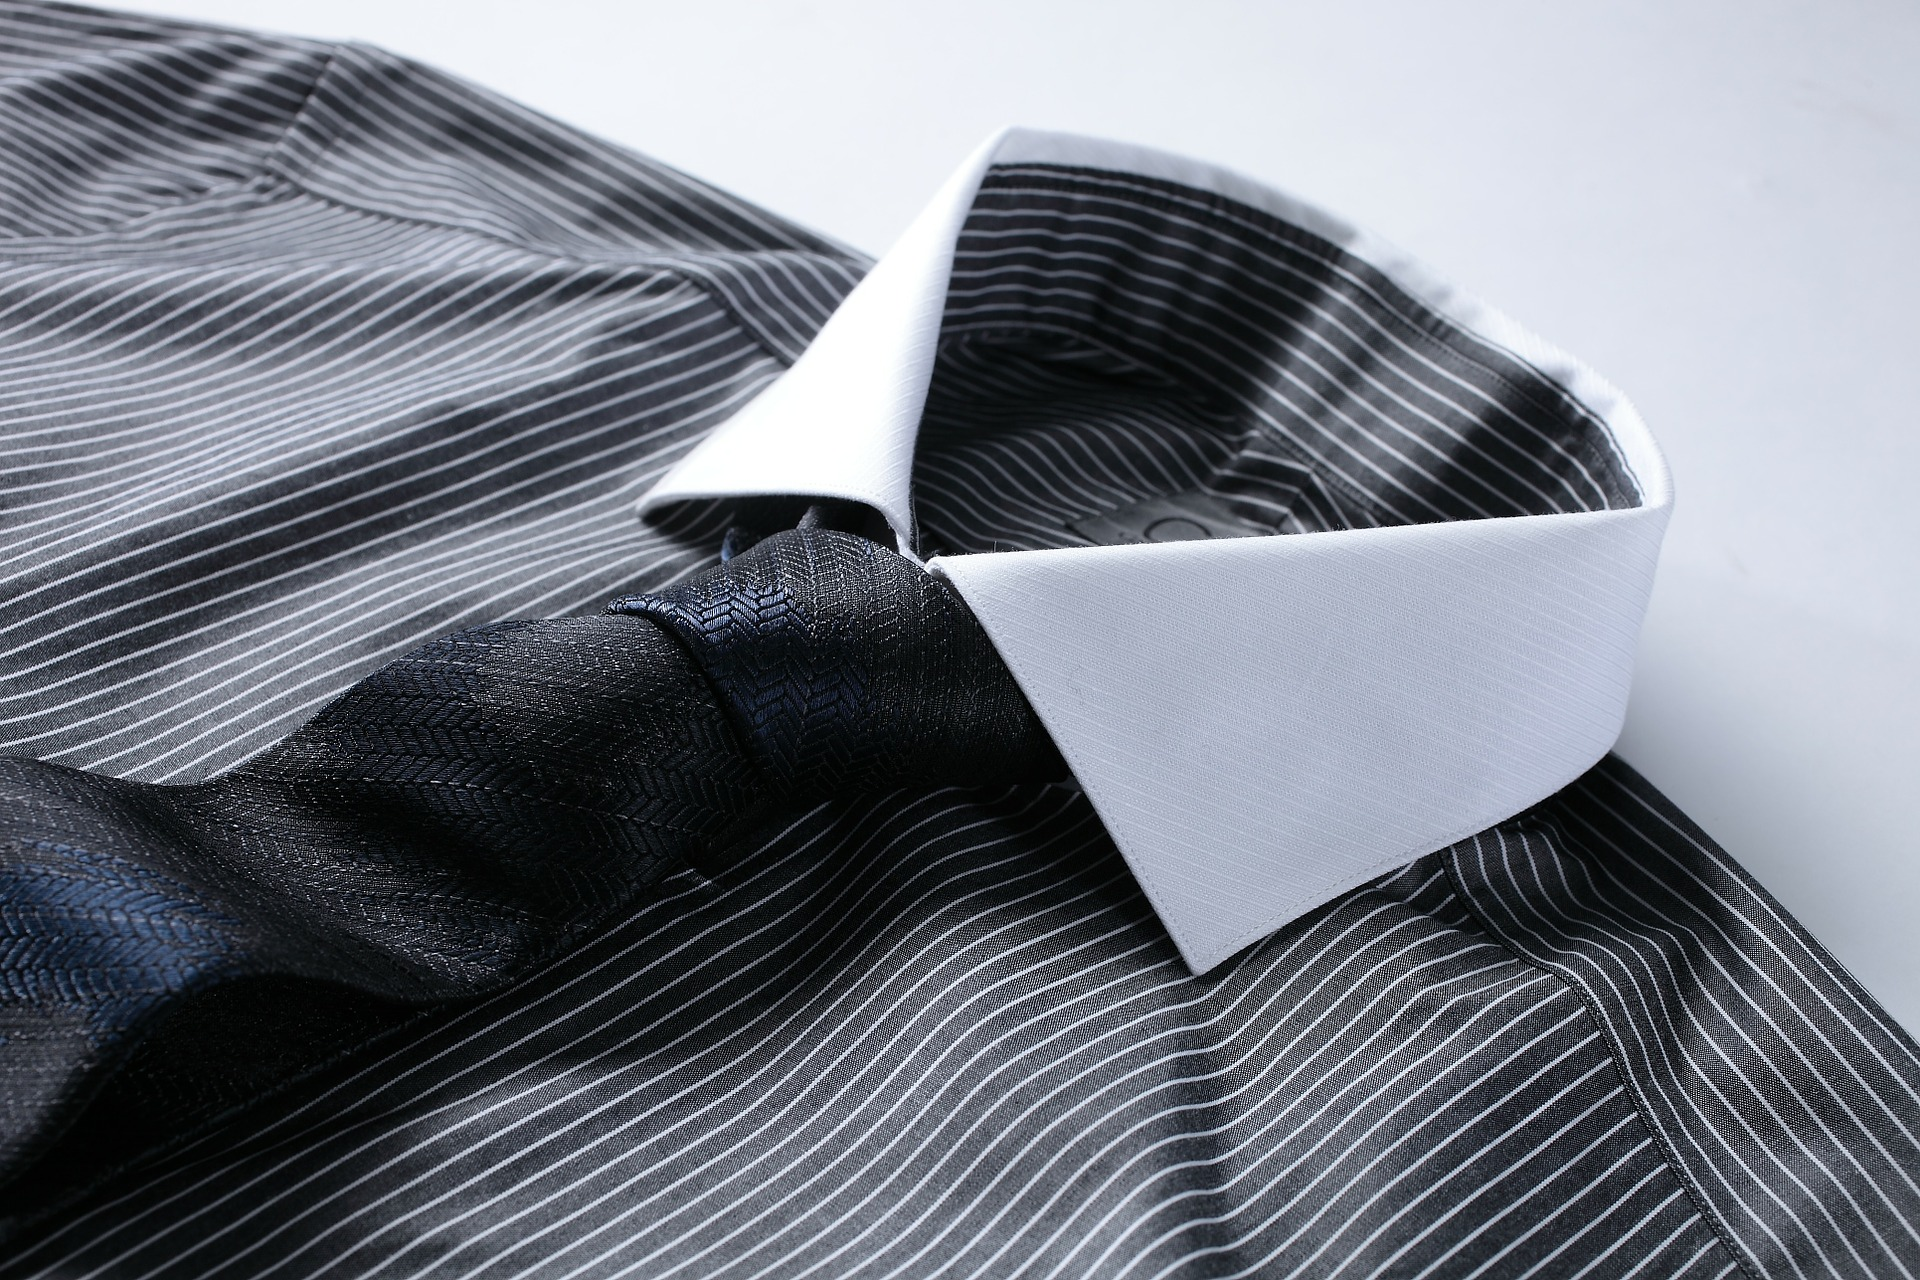 fabrication d 39 une cravate. Black Bedroom Furniture Sets. Home Design Ideas